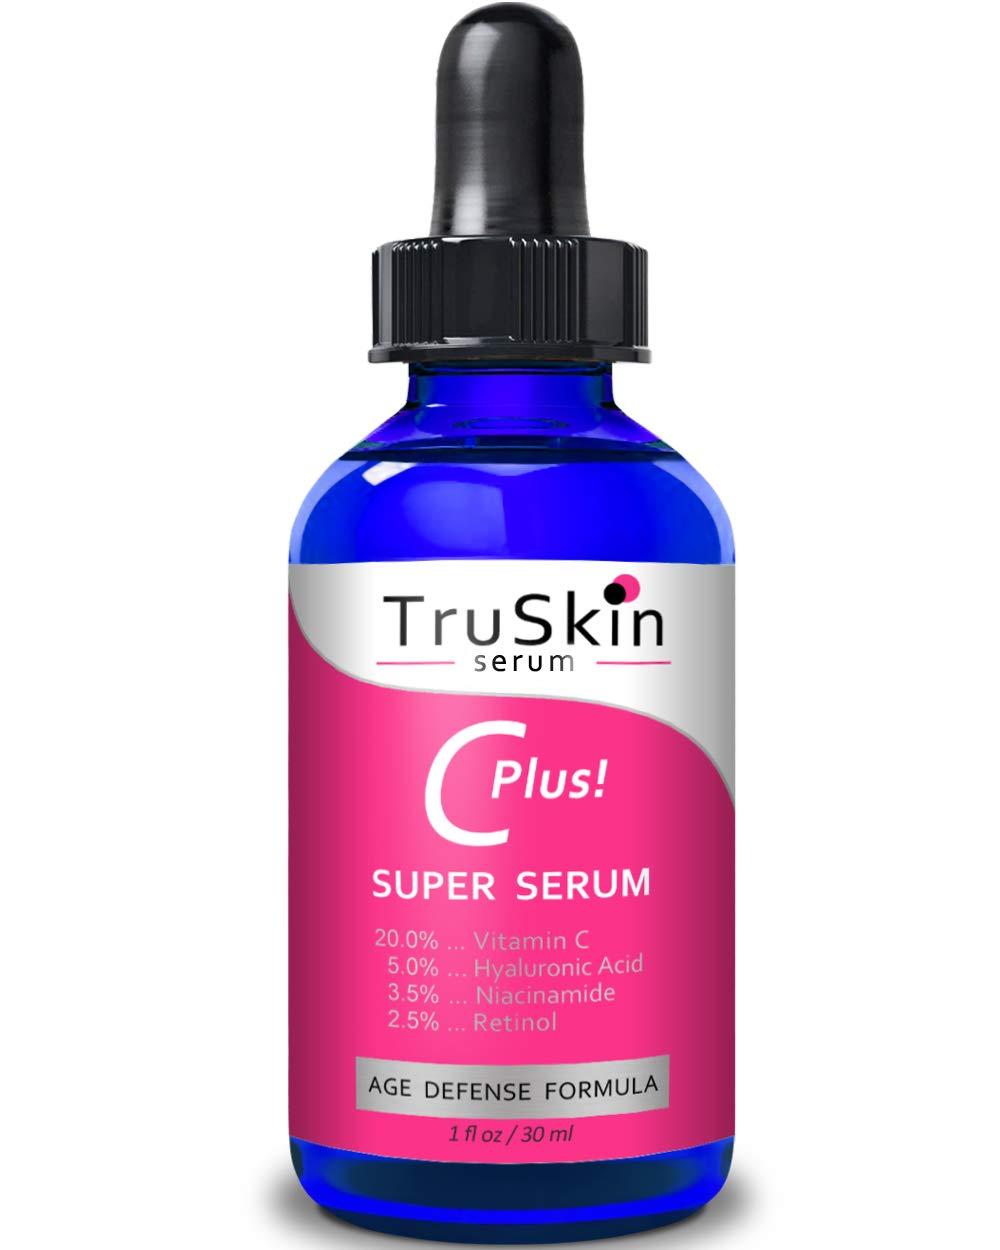 TruSkin Vitamin C-Plus Super Serum, Anti Aging Anti-Wrinkle Facial Serum with Niacinamide, Retinol, Hyaluronic Acid, and Salicylic Acid, 1 oz by TruSkin Naturals (Image #2)